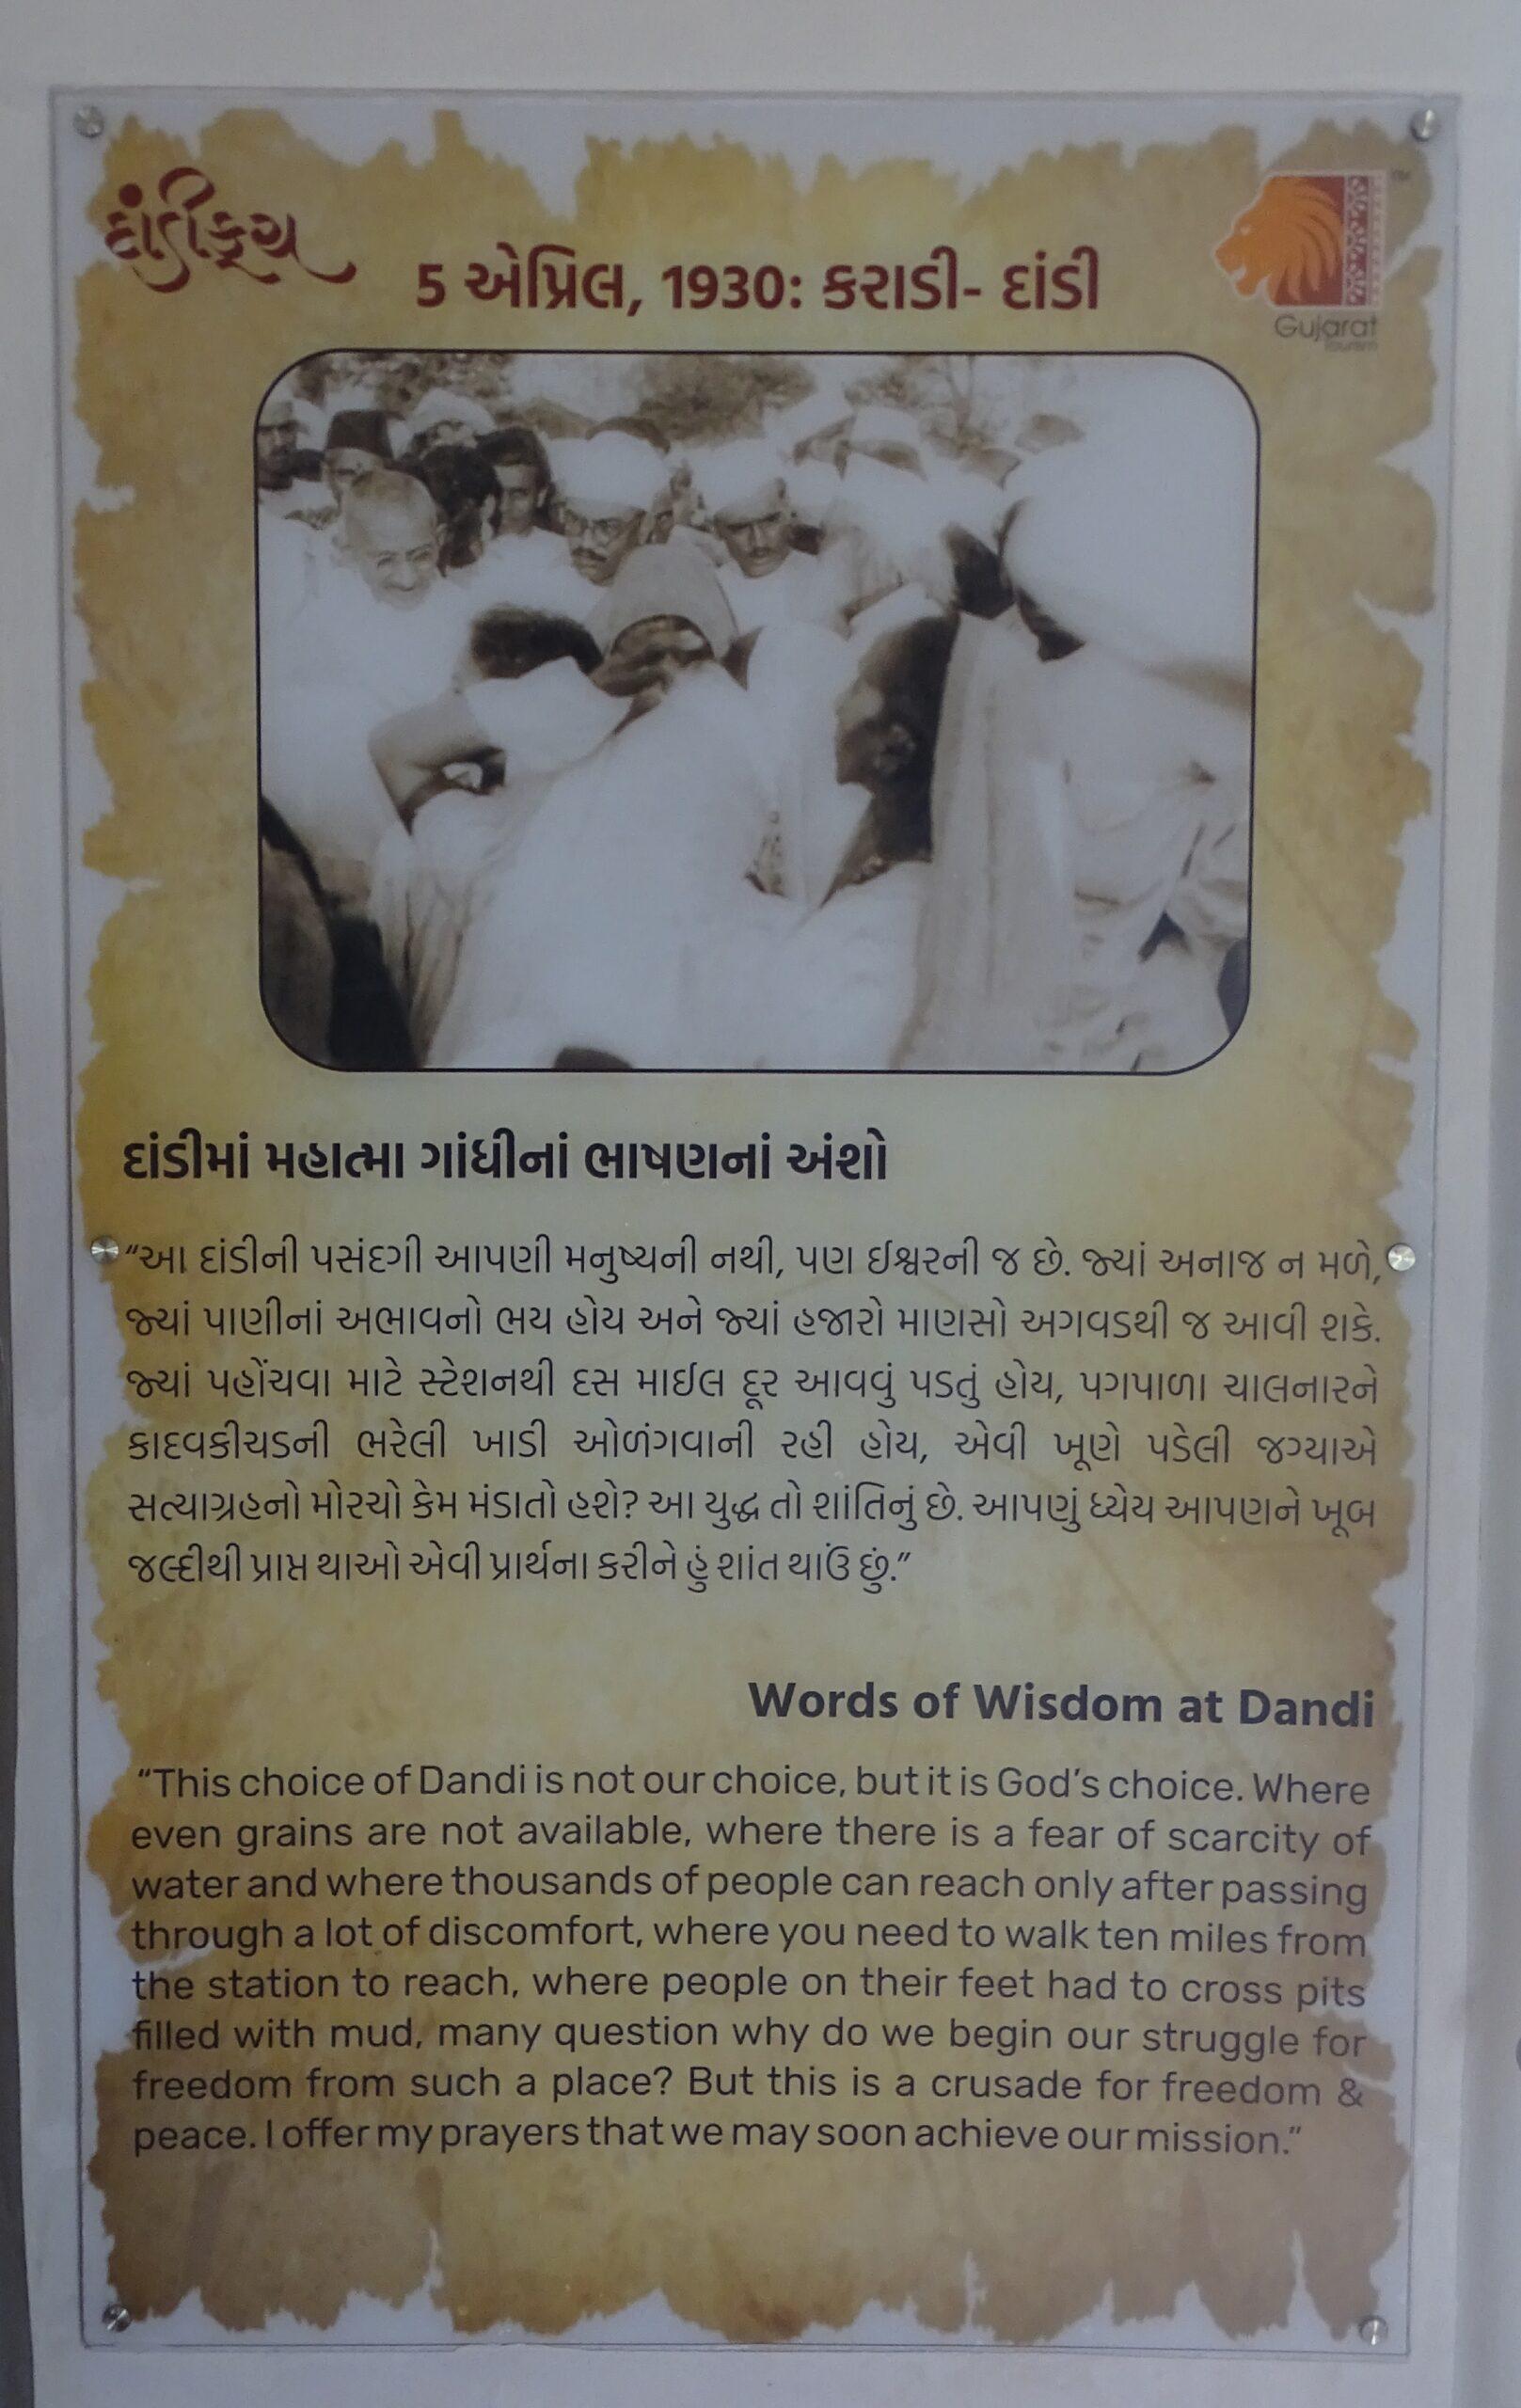 5th April, 1930 - Words of Wisdom by Mahatma Gandhi at Dandi, Gujarat